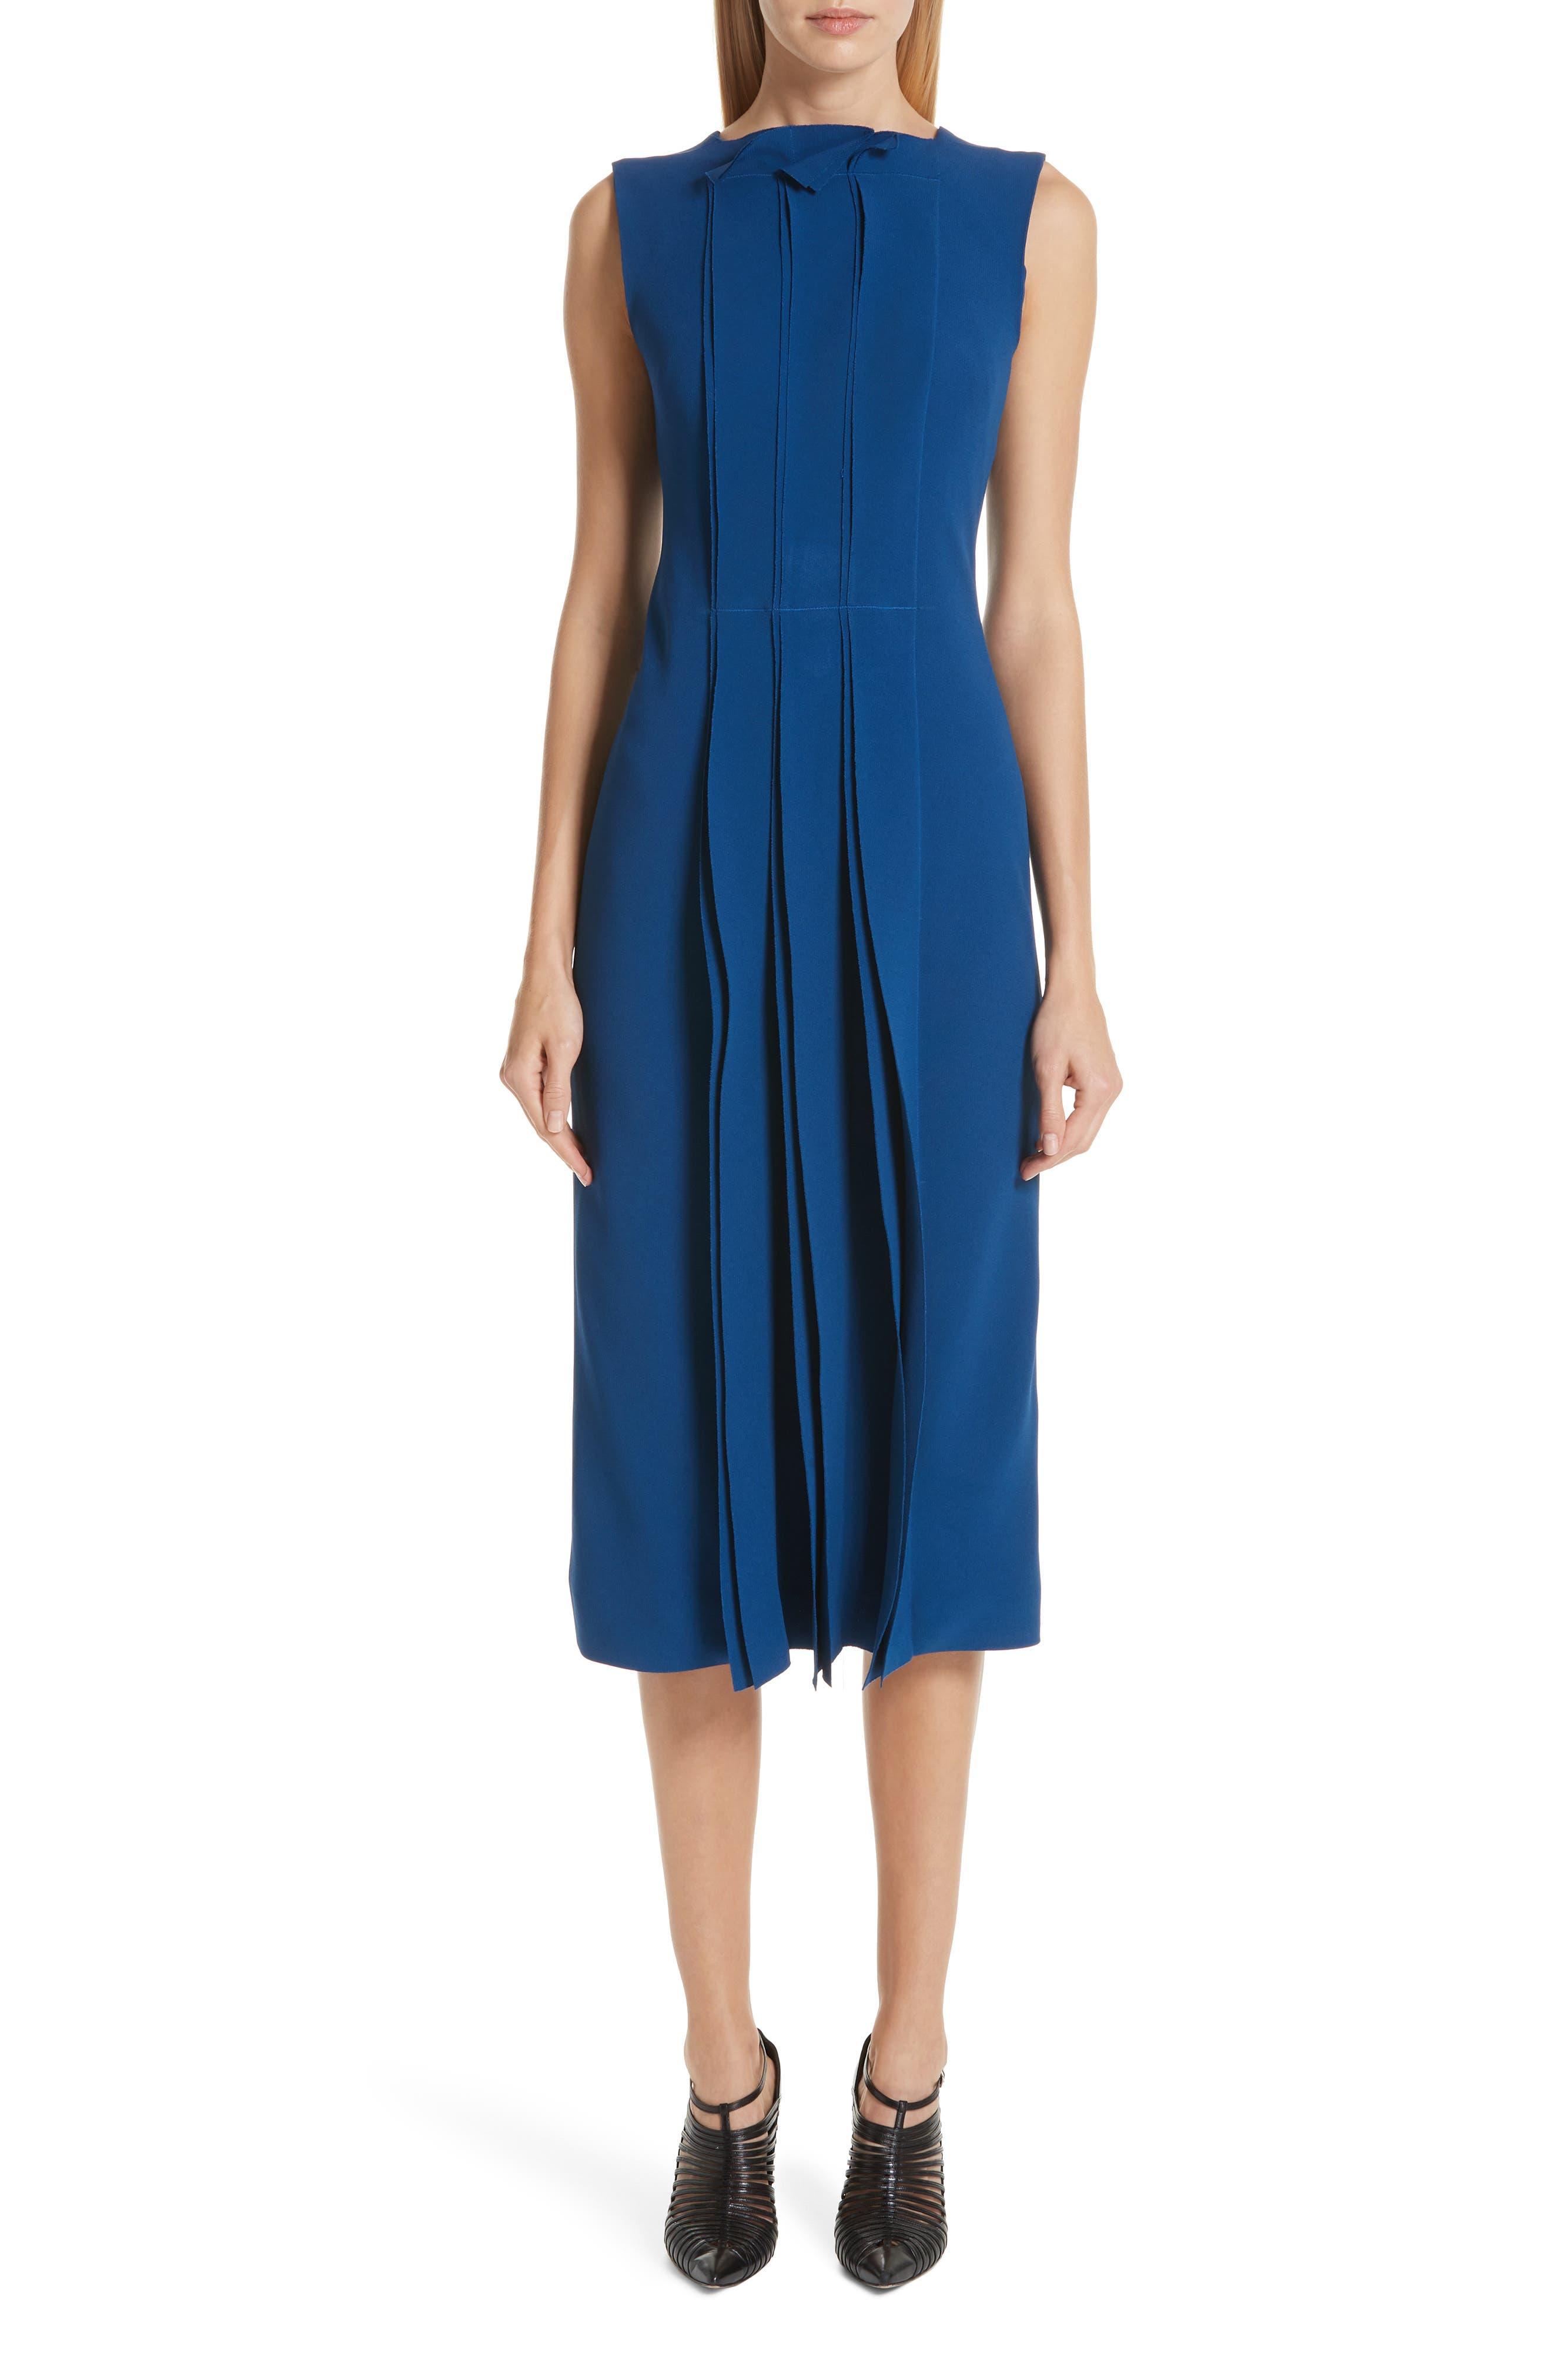 Jason Wu Collection Stretch Cady Dress, Blue